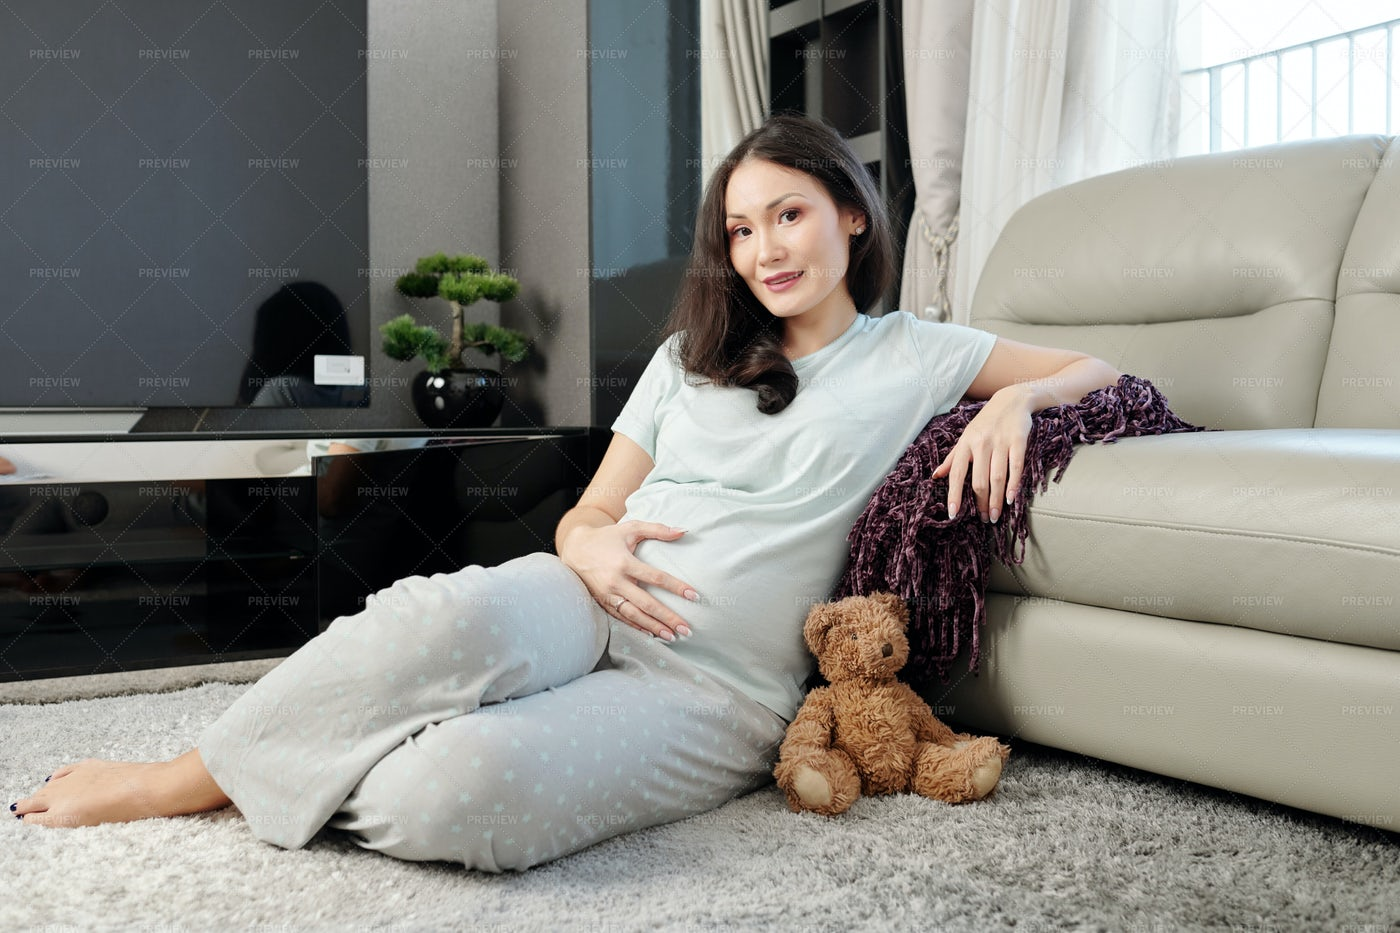 Pregnant Woman At Home: Stock Photos